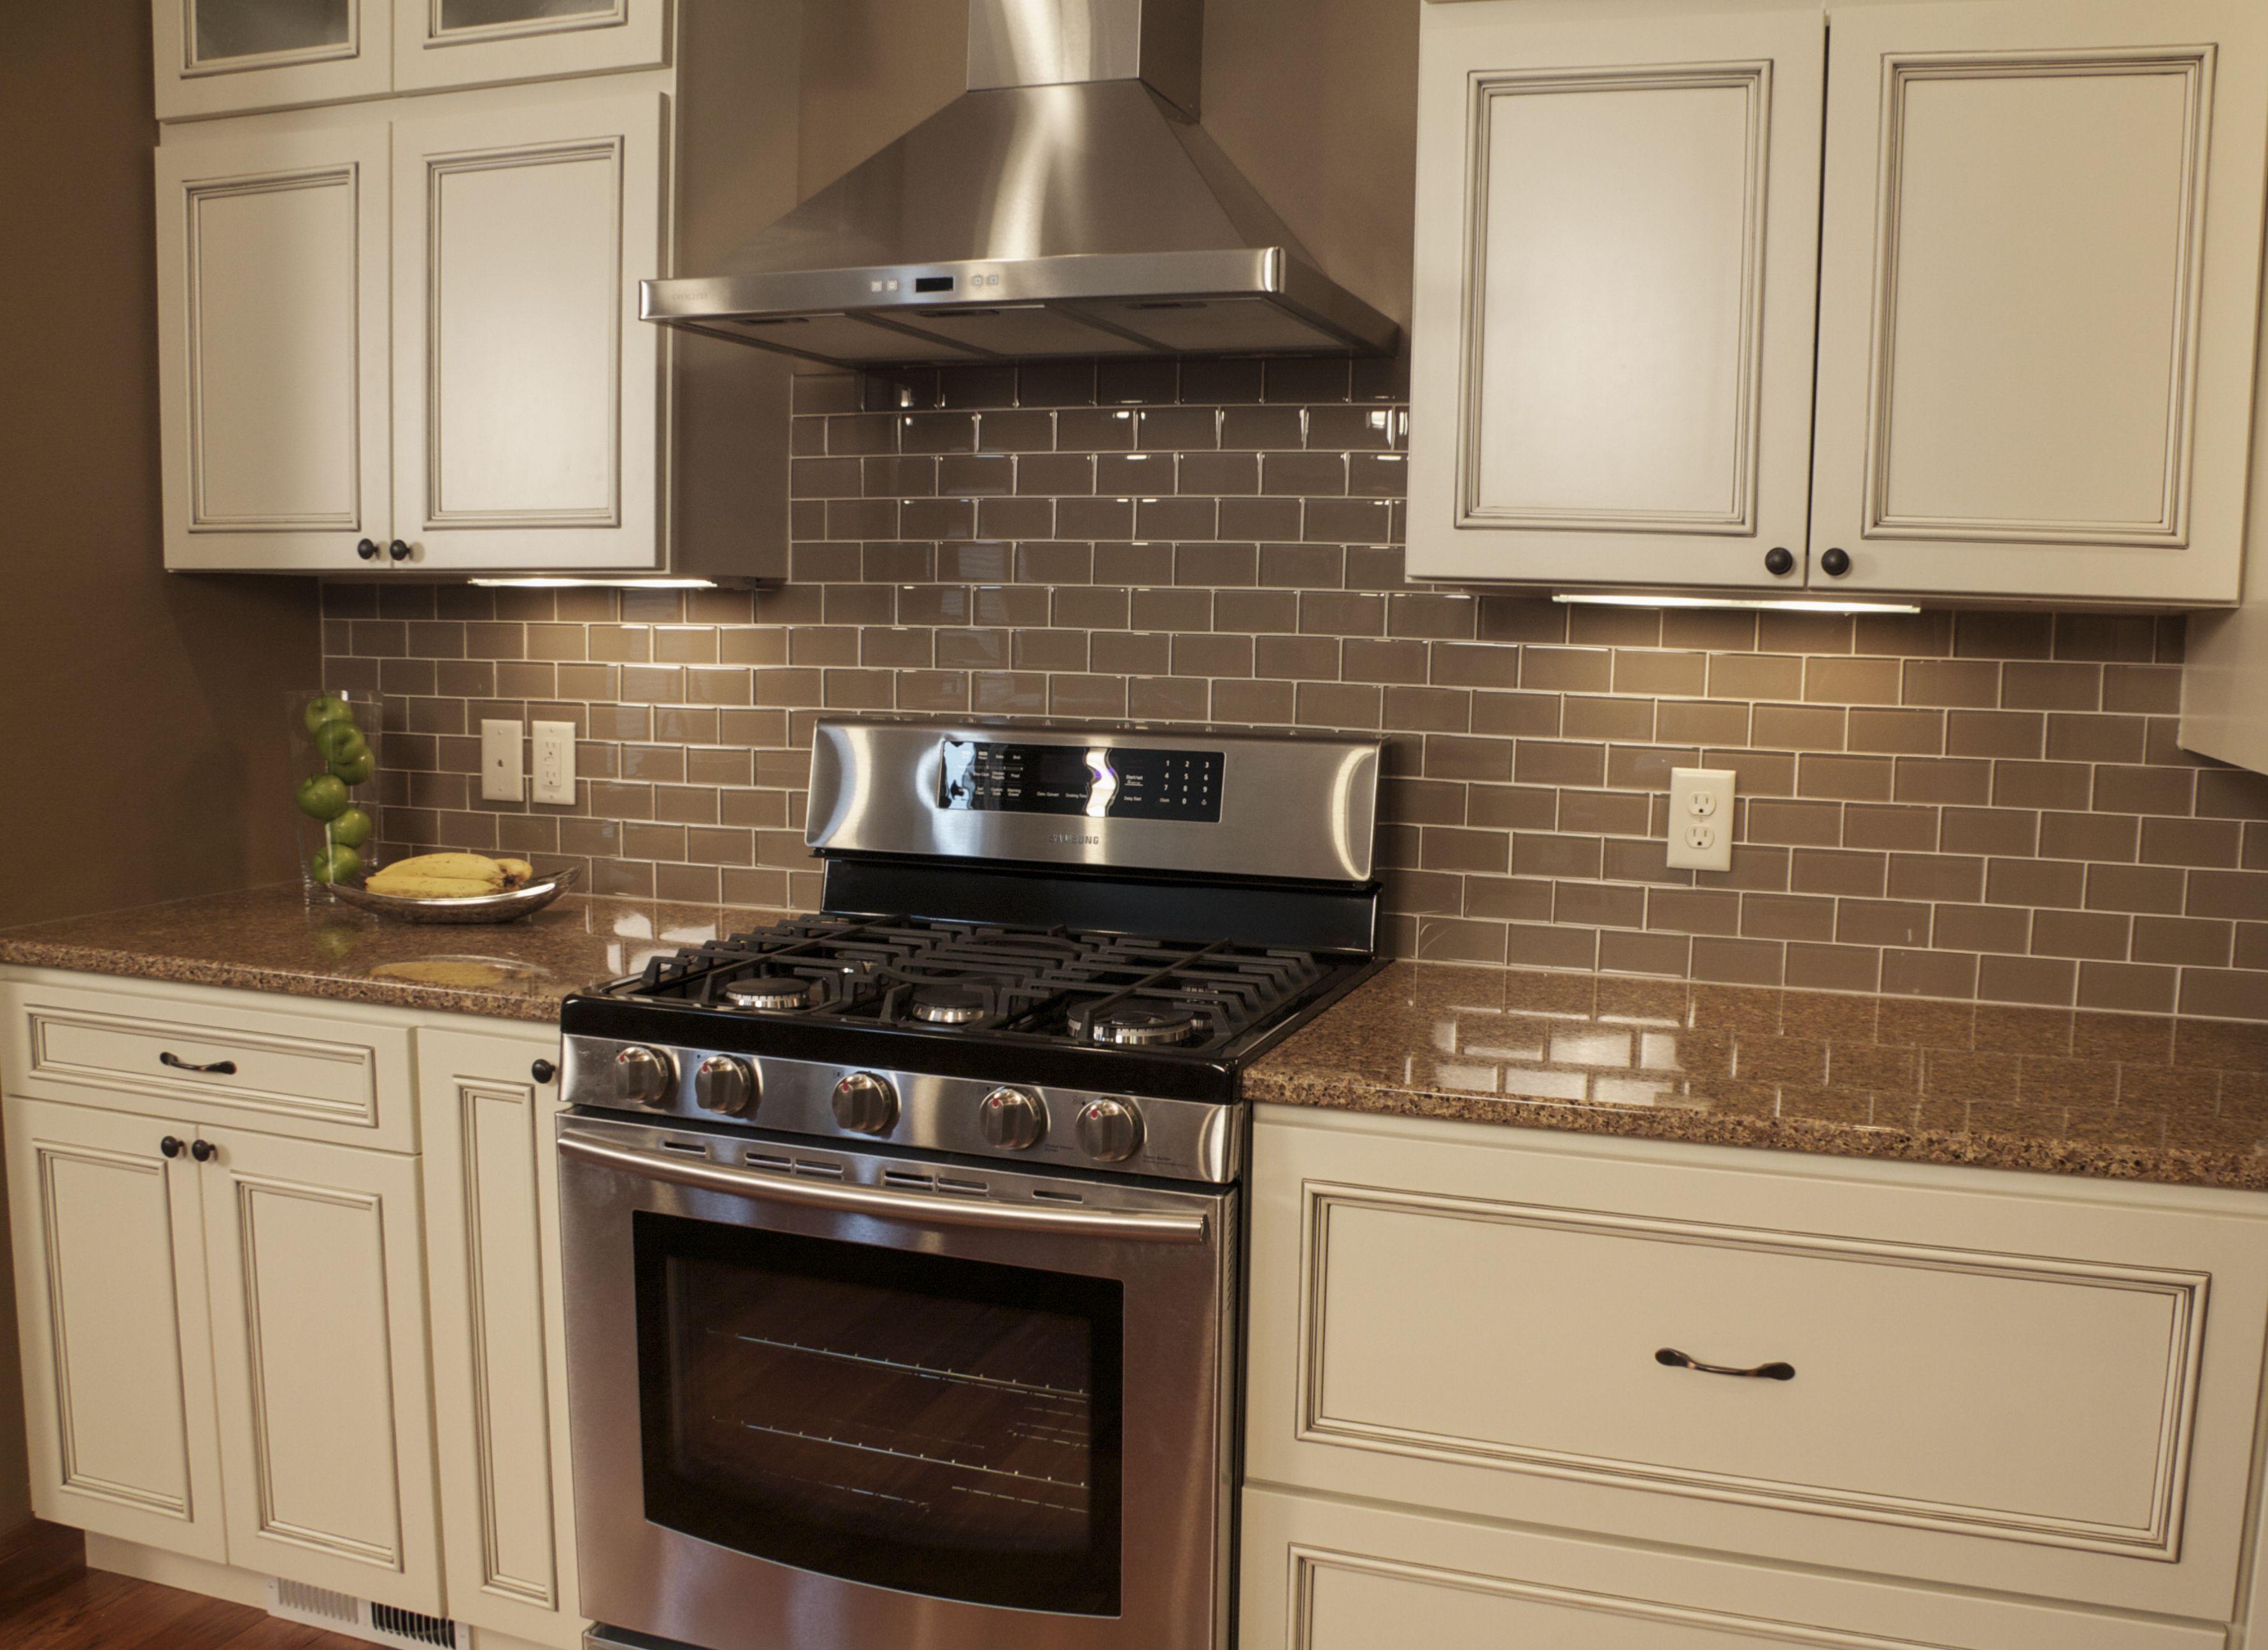 Riverstone Quartz Countertops Finish Off This Clic Kitchen Shown In Sedona